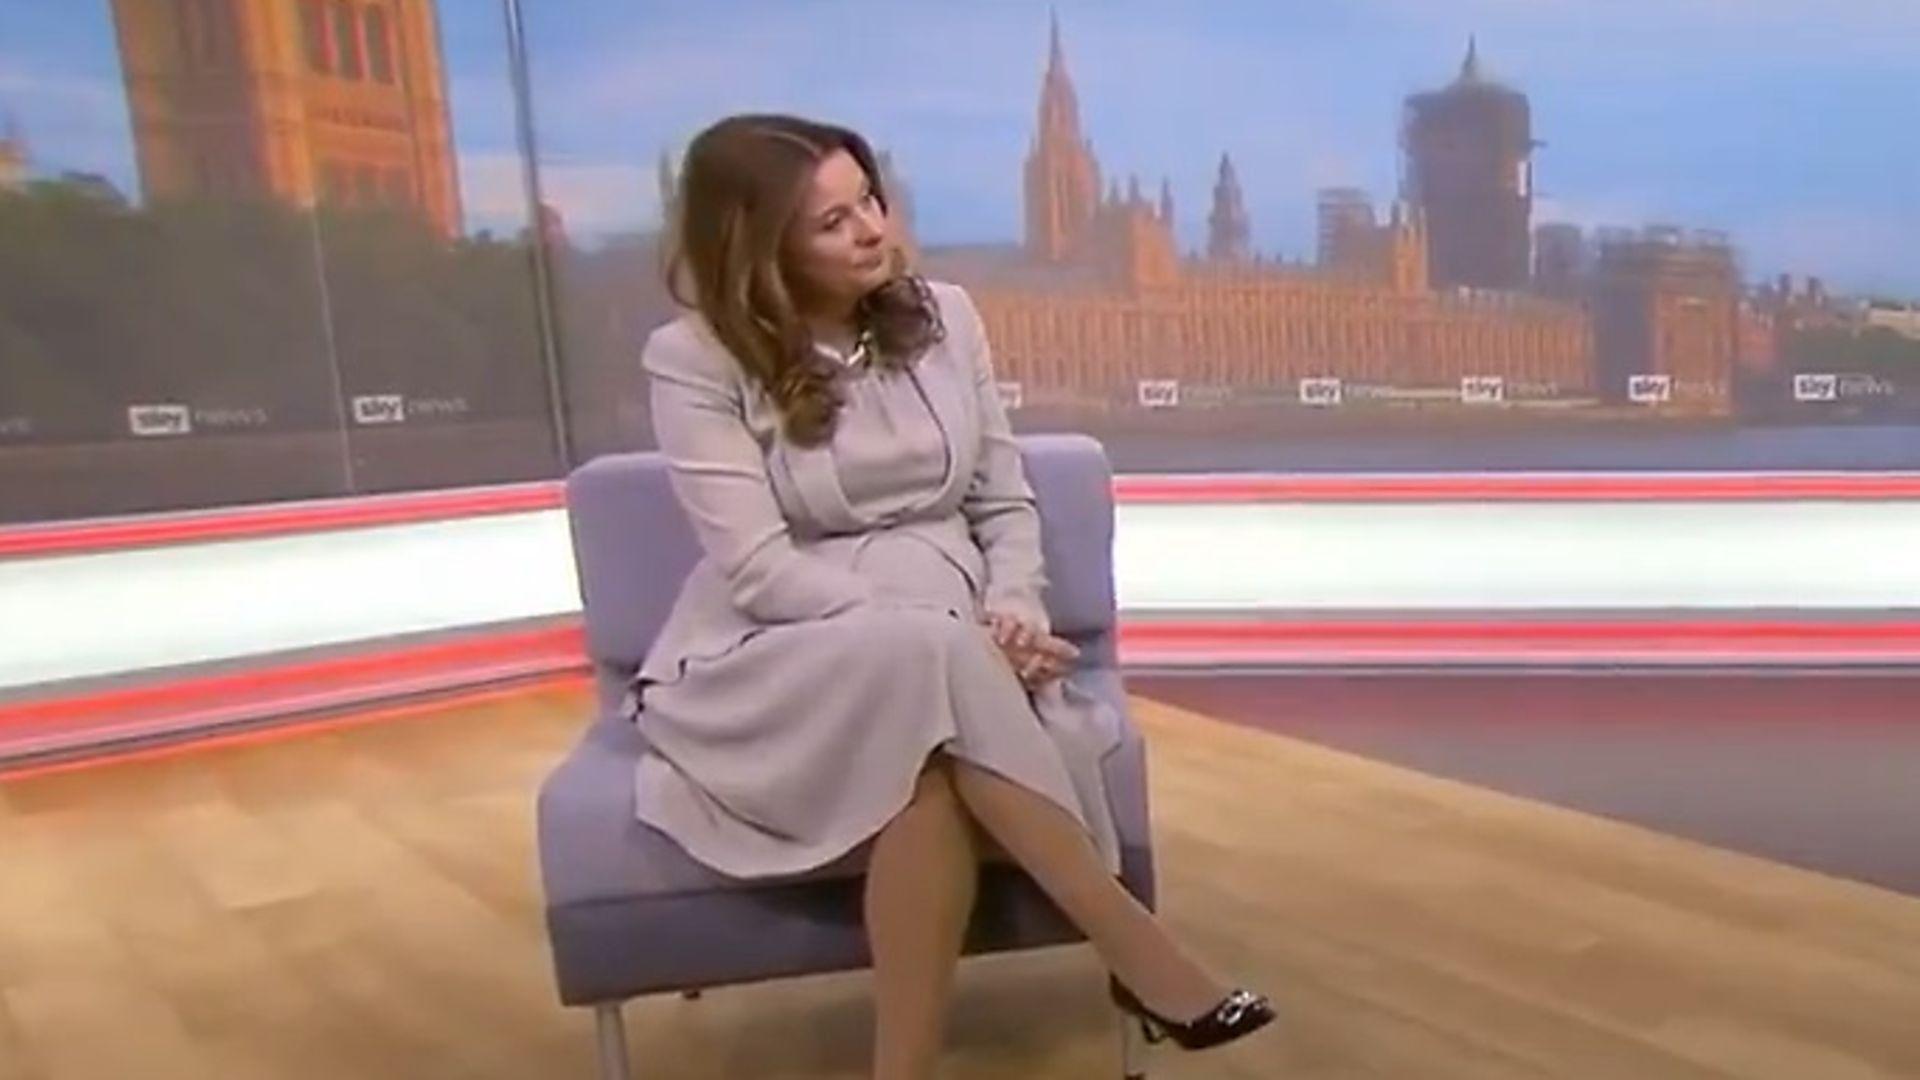 Gillian Keegan during one of her broadcast interviews - Credit: Sky News